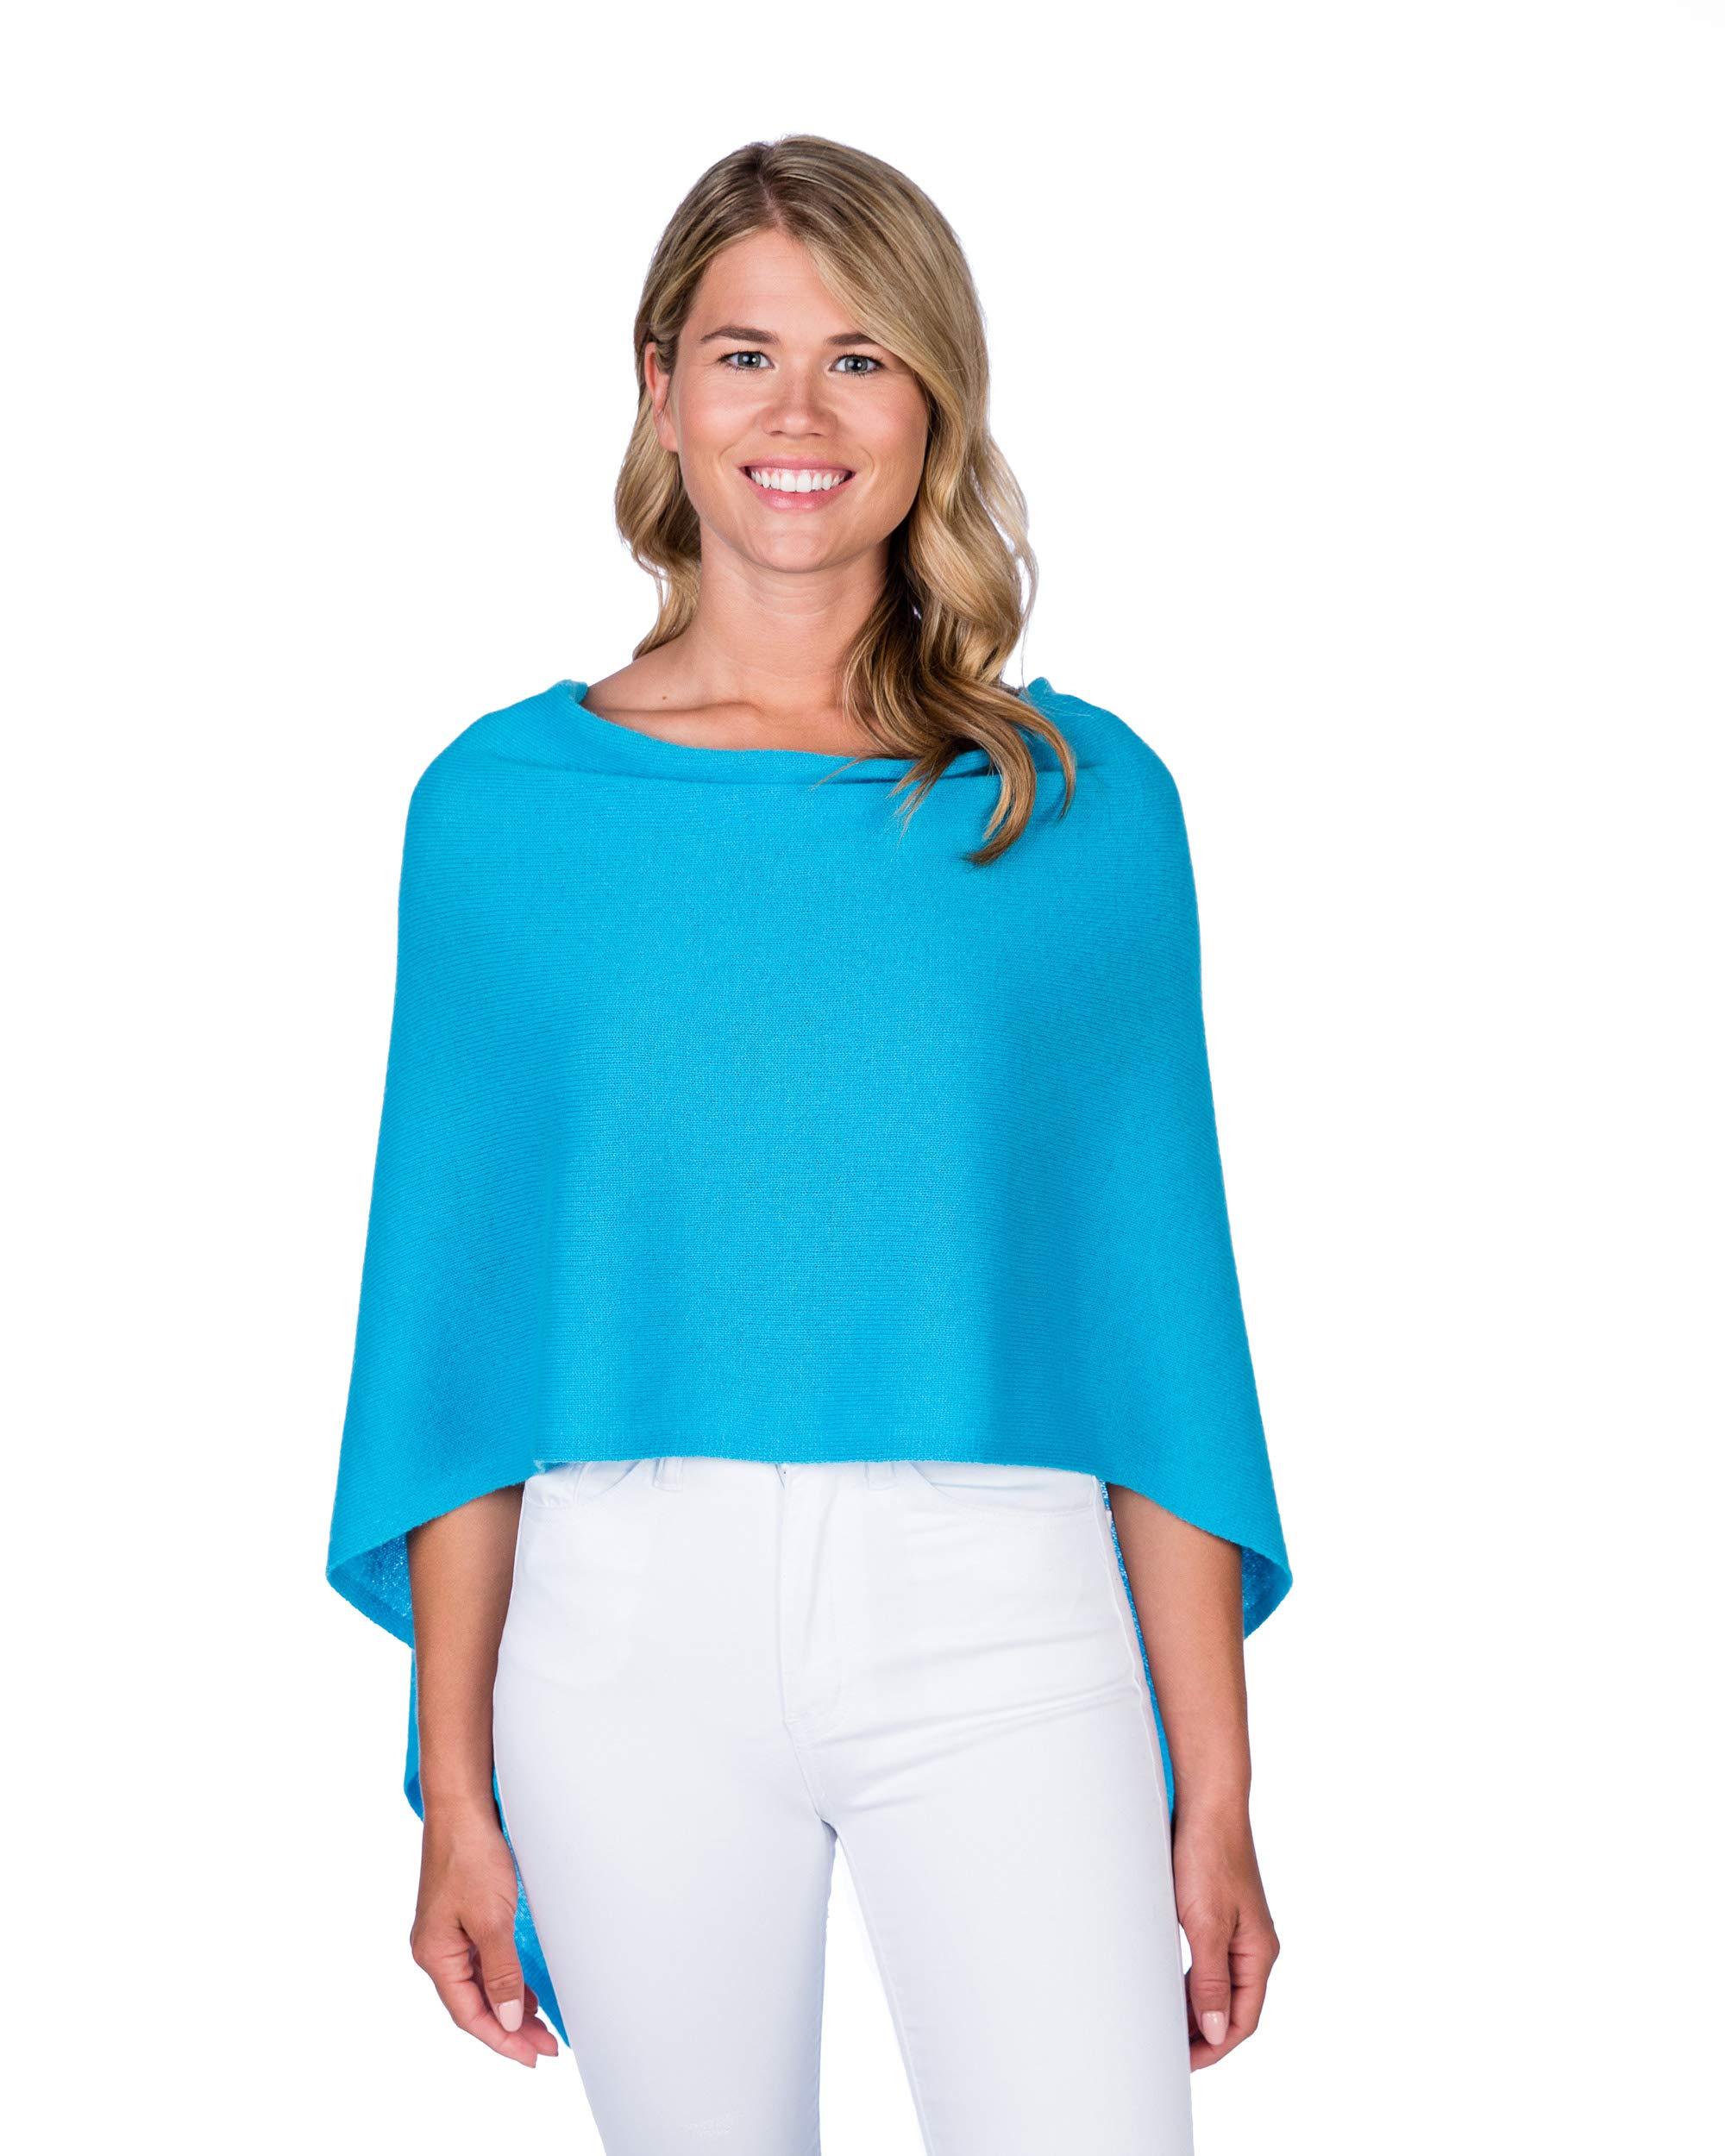 Alashan Cashmere Claudia Nichole Cashmere Draped Dress Topper - Turquoise/715